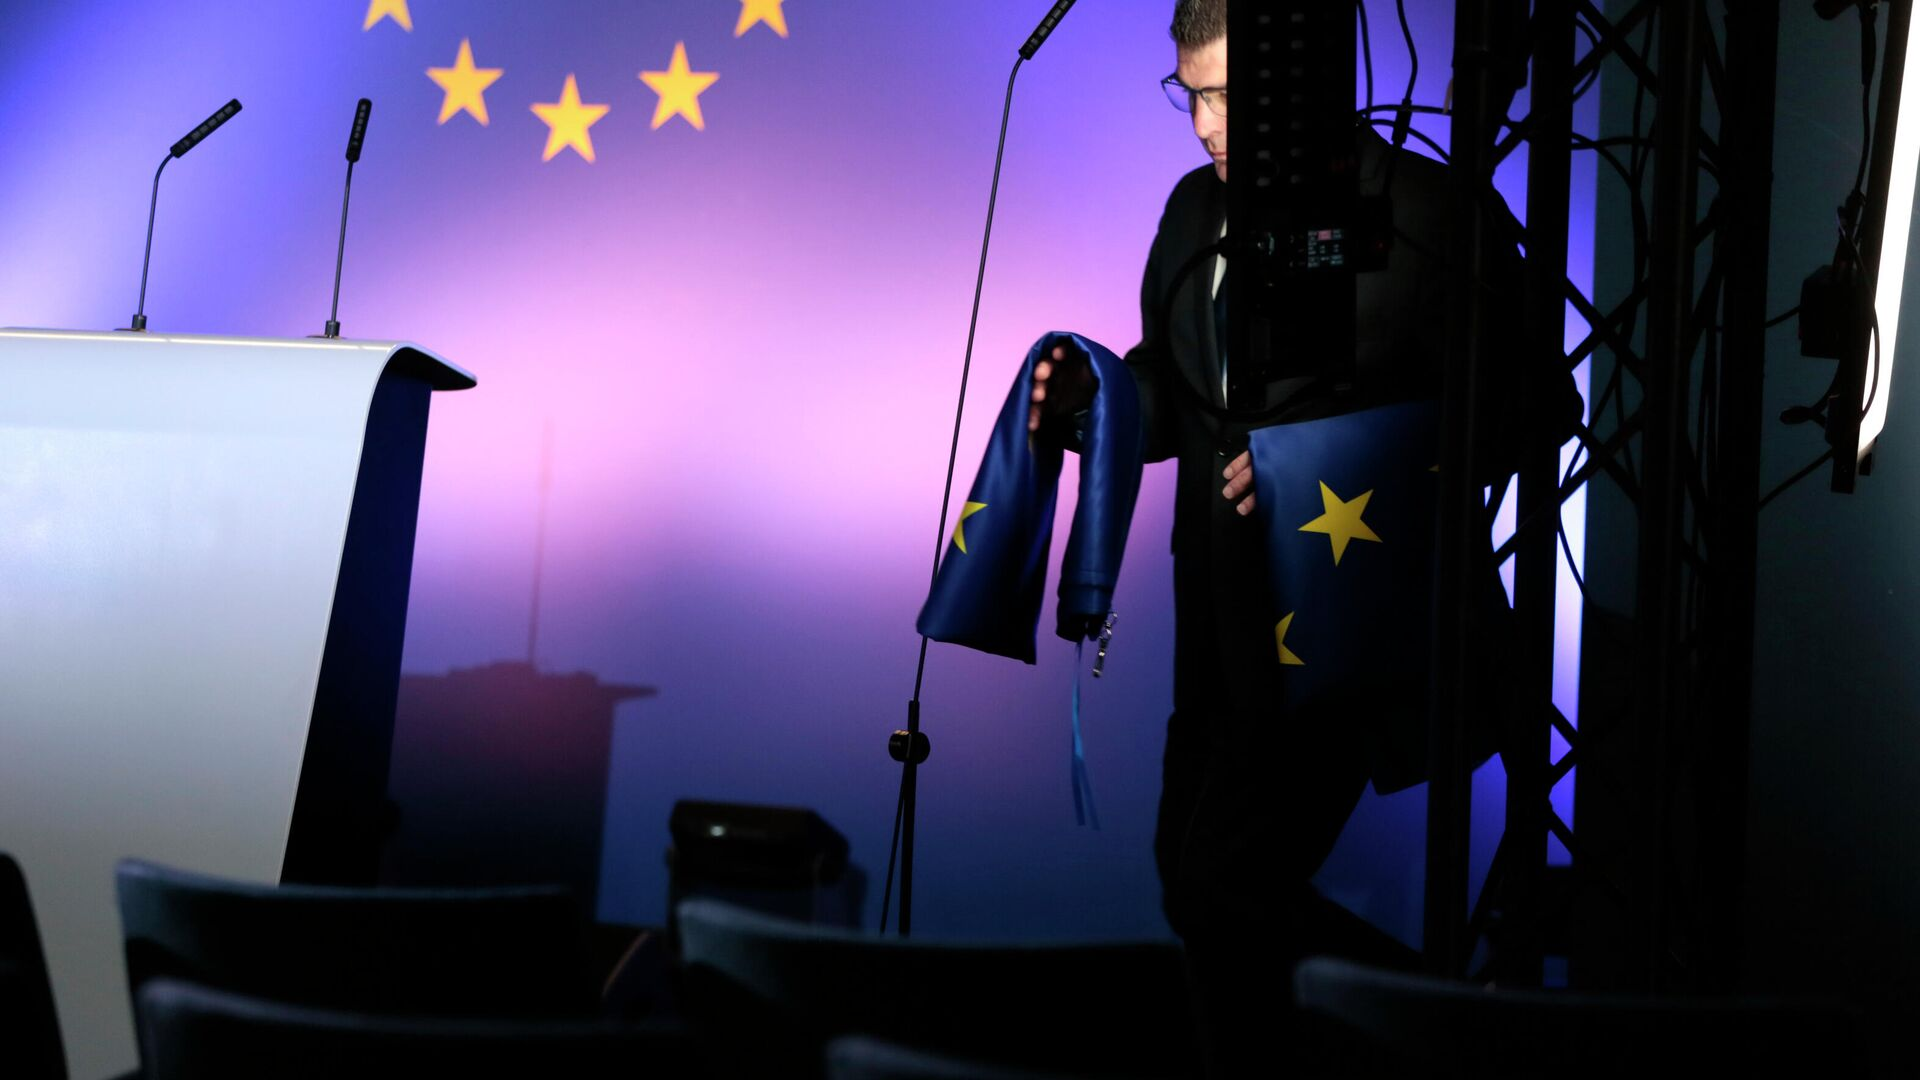 Сотрудник службы протокола с флагами ЕС в штаб-квартире Евросоюза в Брюсселе - РИА Новости, 1920, 19.07.2021